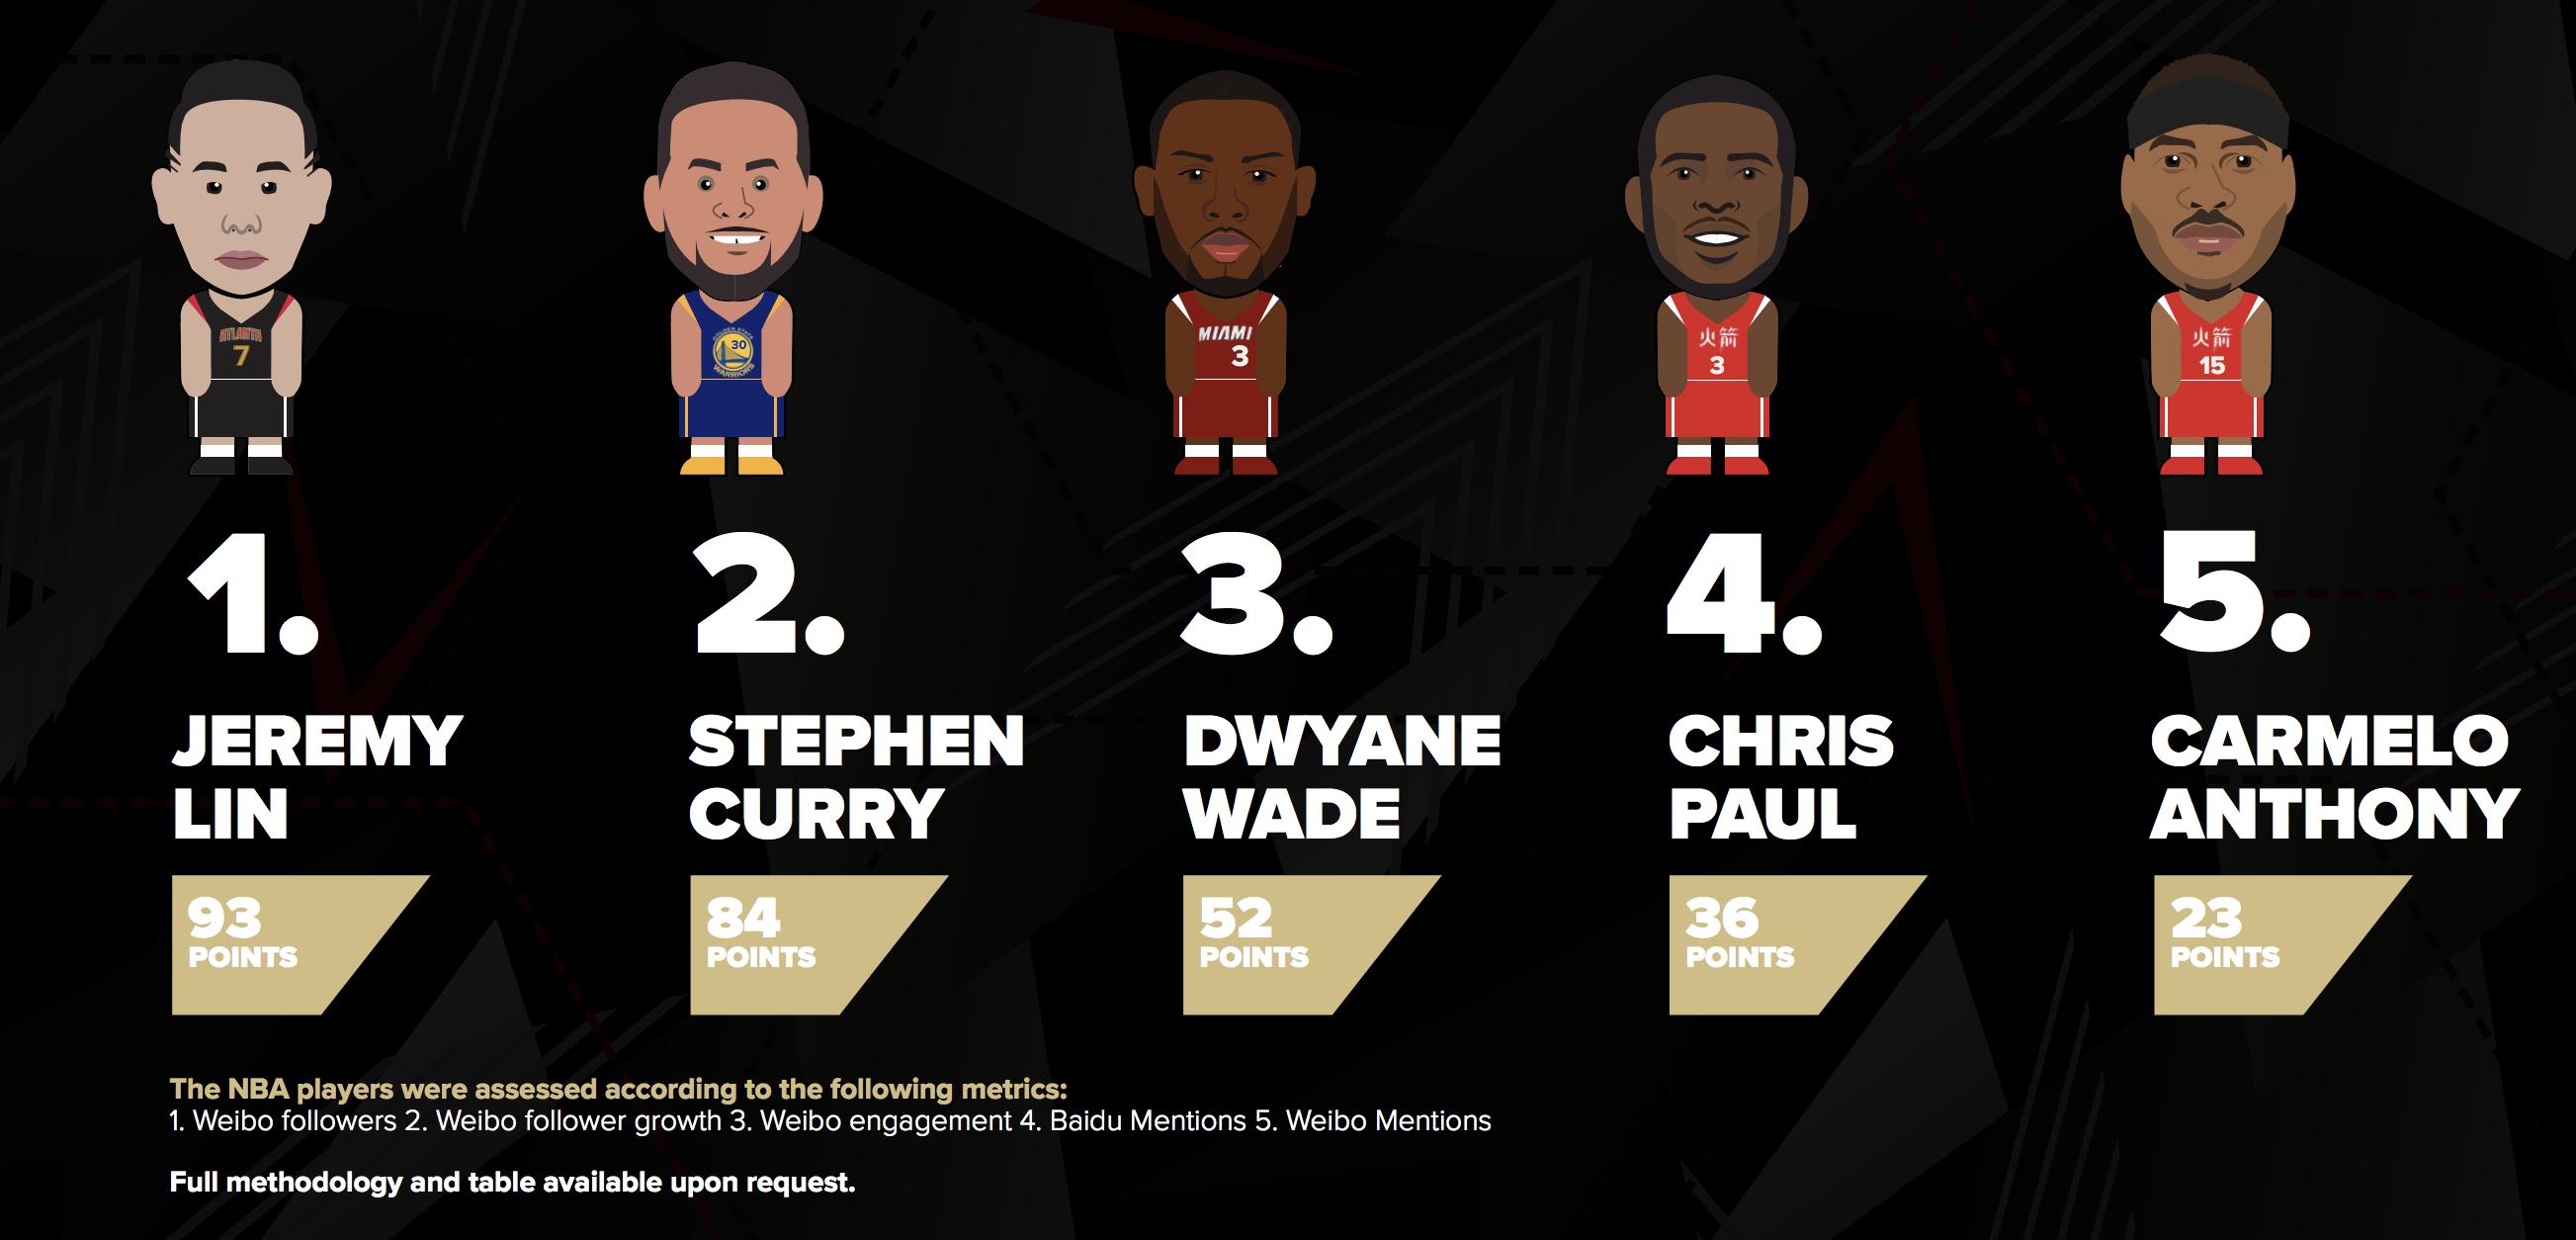 《NBA RED CARD 2018》发布,金州勇士和林书豪排名数字媒体影响力榜首